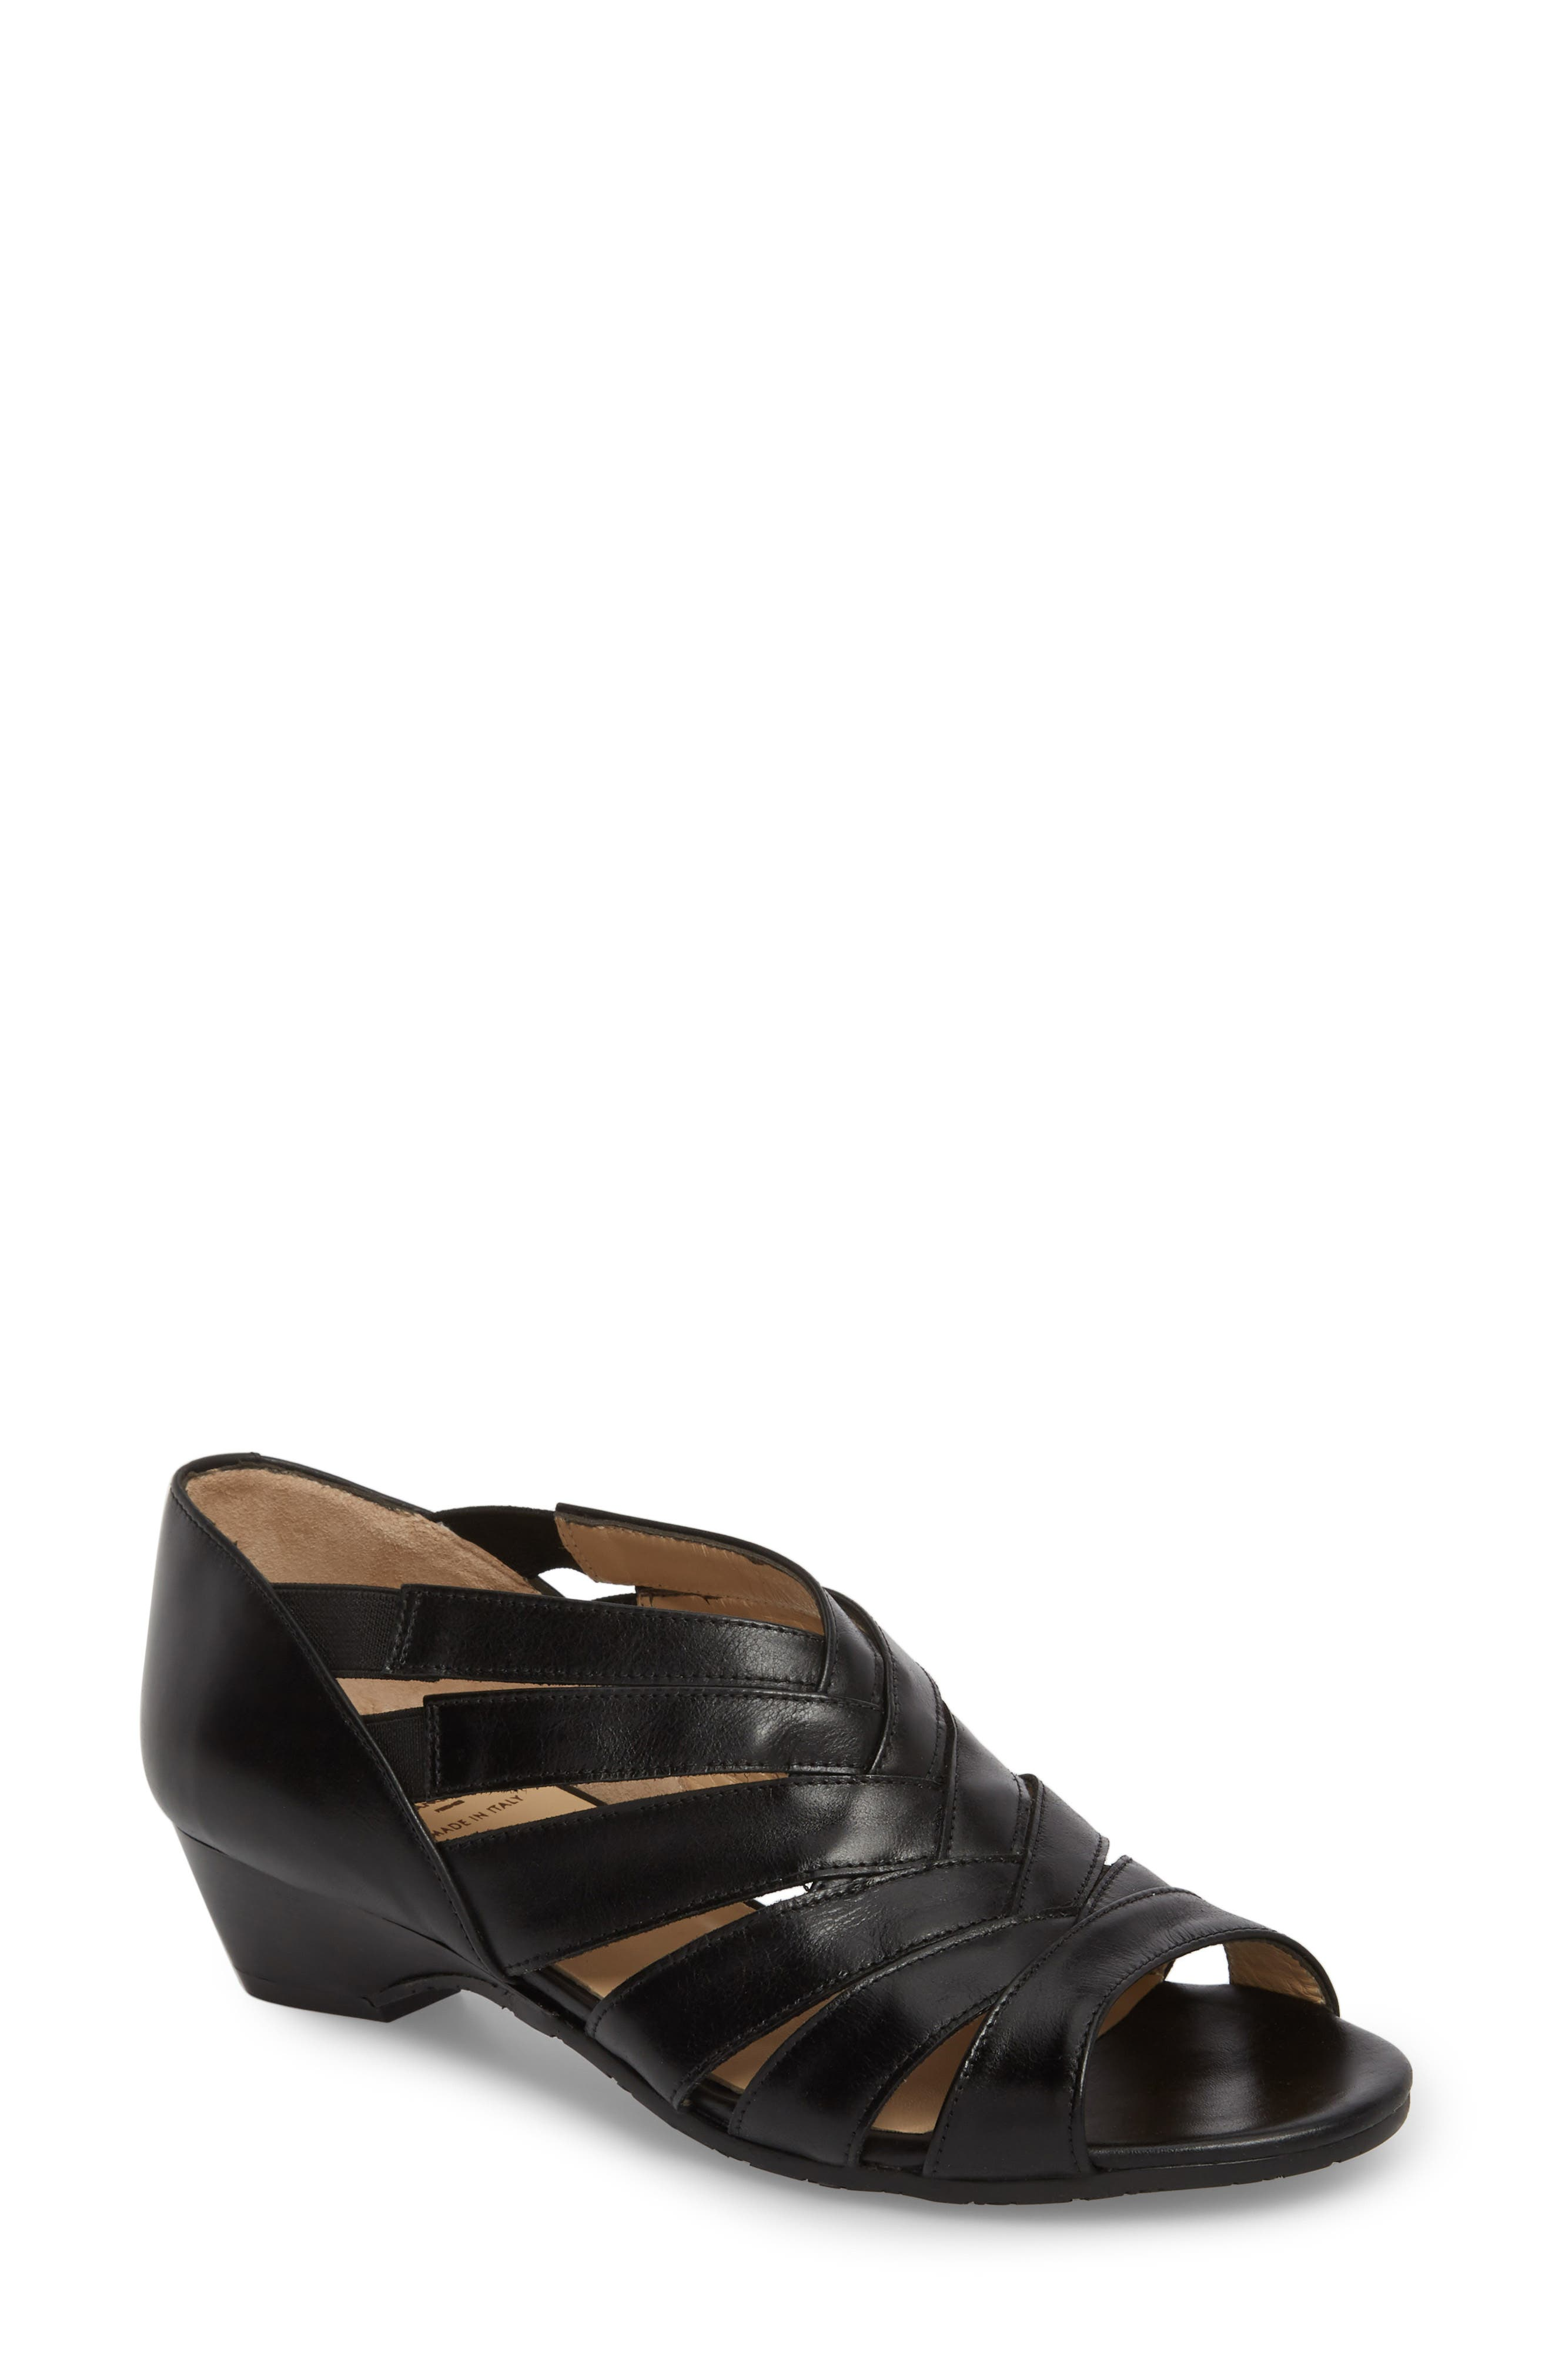 Demetra Sandal,                         Main,                         color, BLACK LEATHER